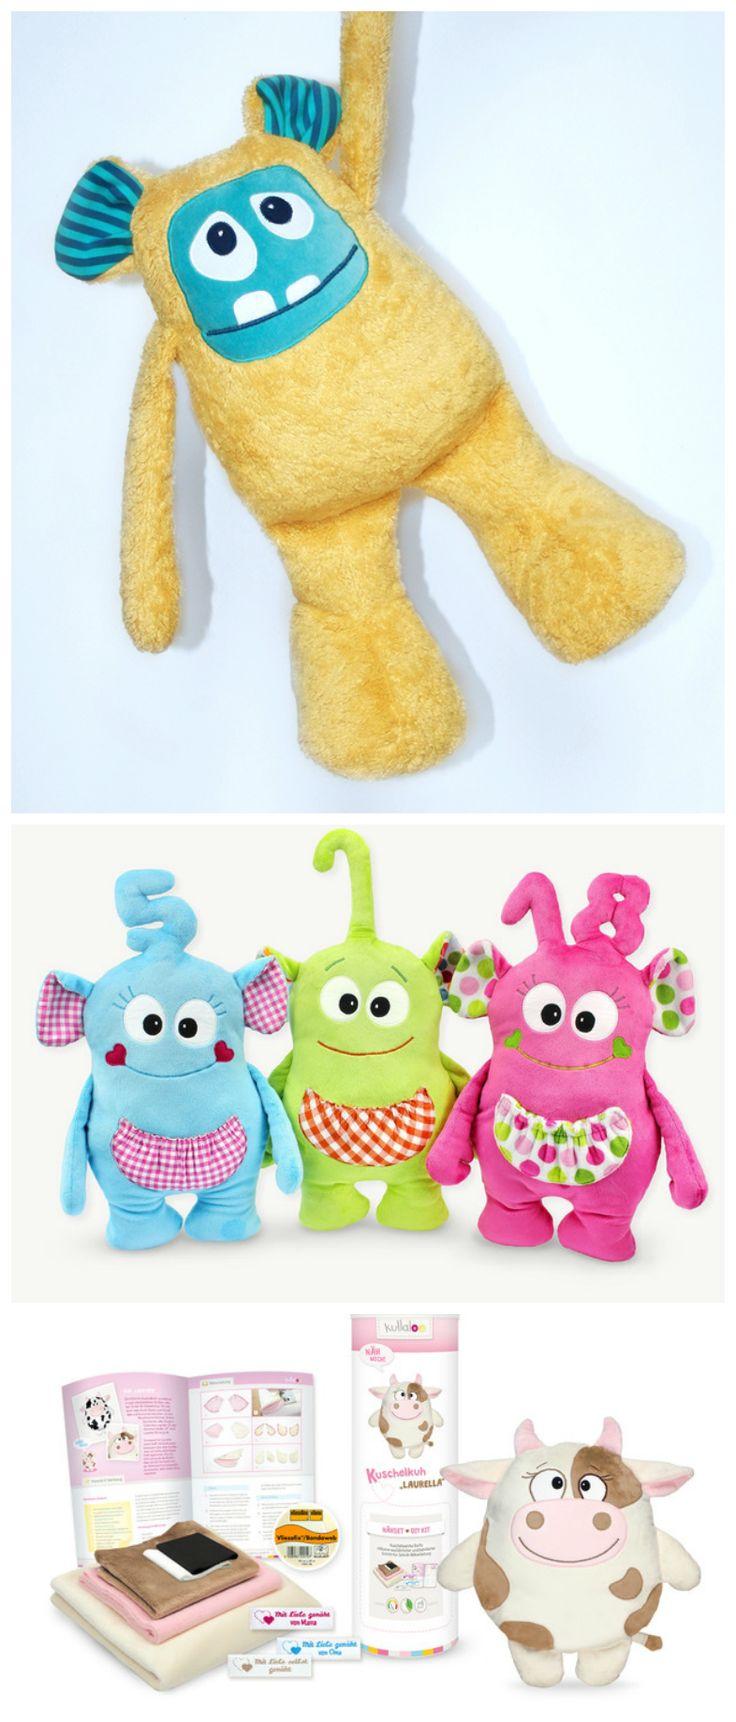 Süße Nähanleitungen für Kuscheltiere, als E-Book oder direkt als Komplettpaket mit Stoff / sewing patterns: cute soft toy diy-kits made by kullaloo via DaWanda.com